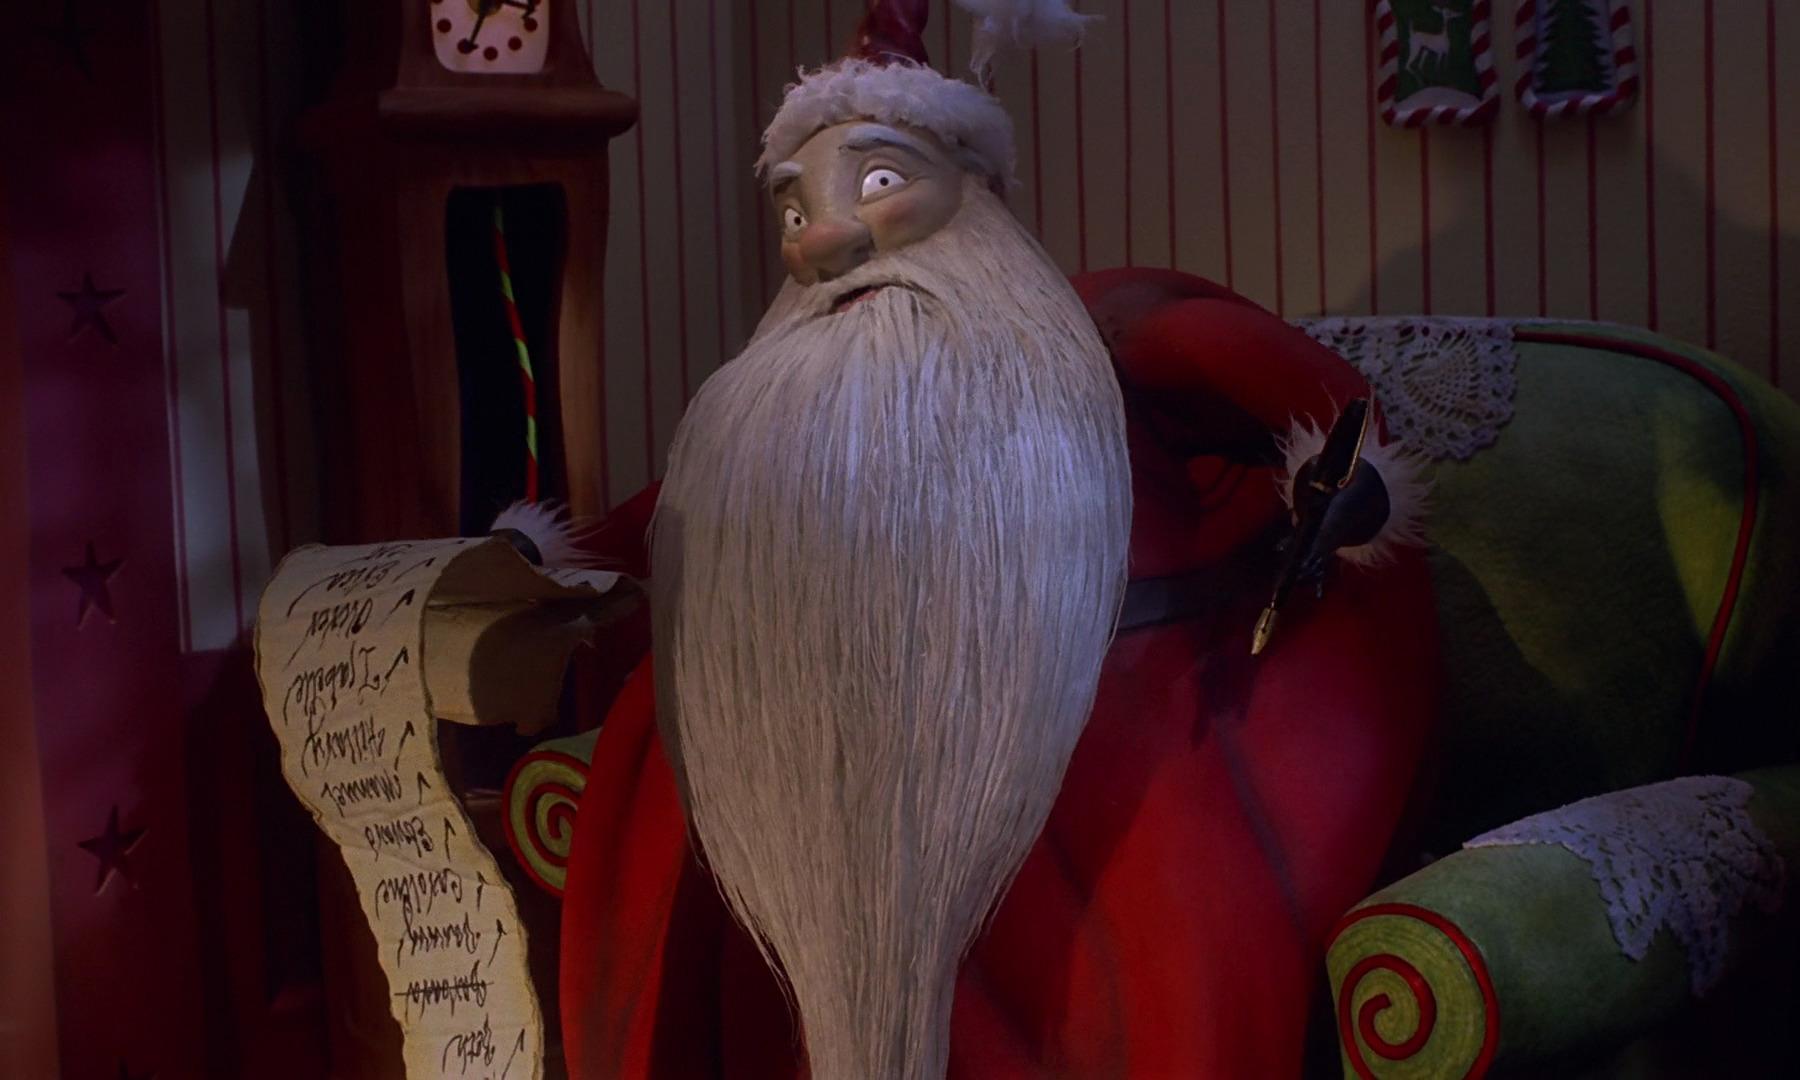 Danny Elfman Tim Burton's The Nightmare Before Christmas - Original Motion Picture Soundtrack